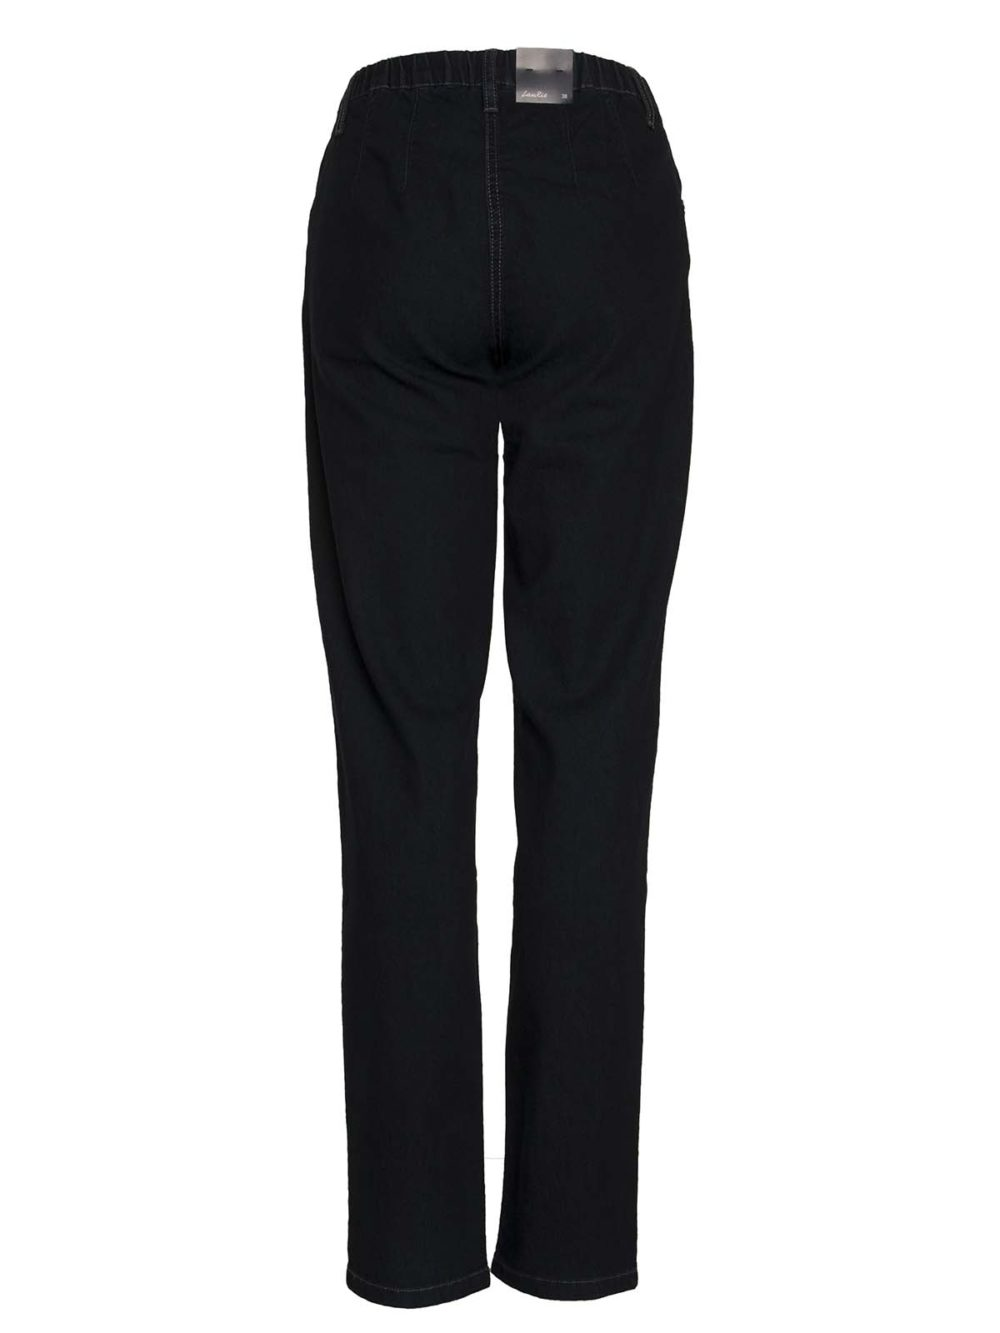 Kelly Regular Trousers Laurie Katie Kerr Women's Clothing